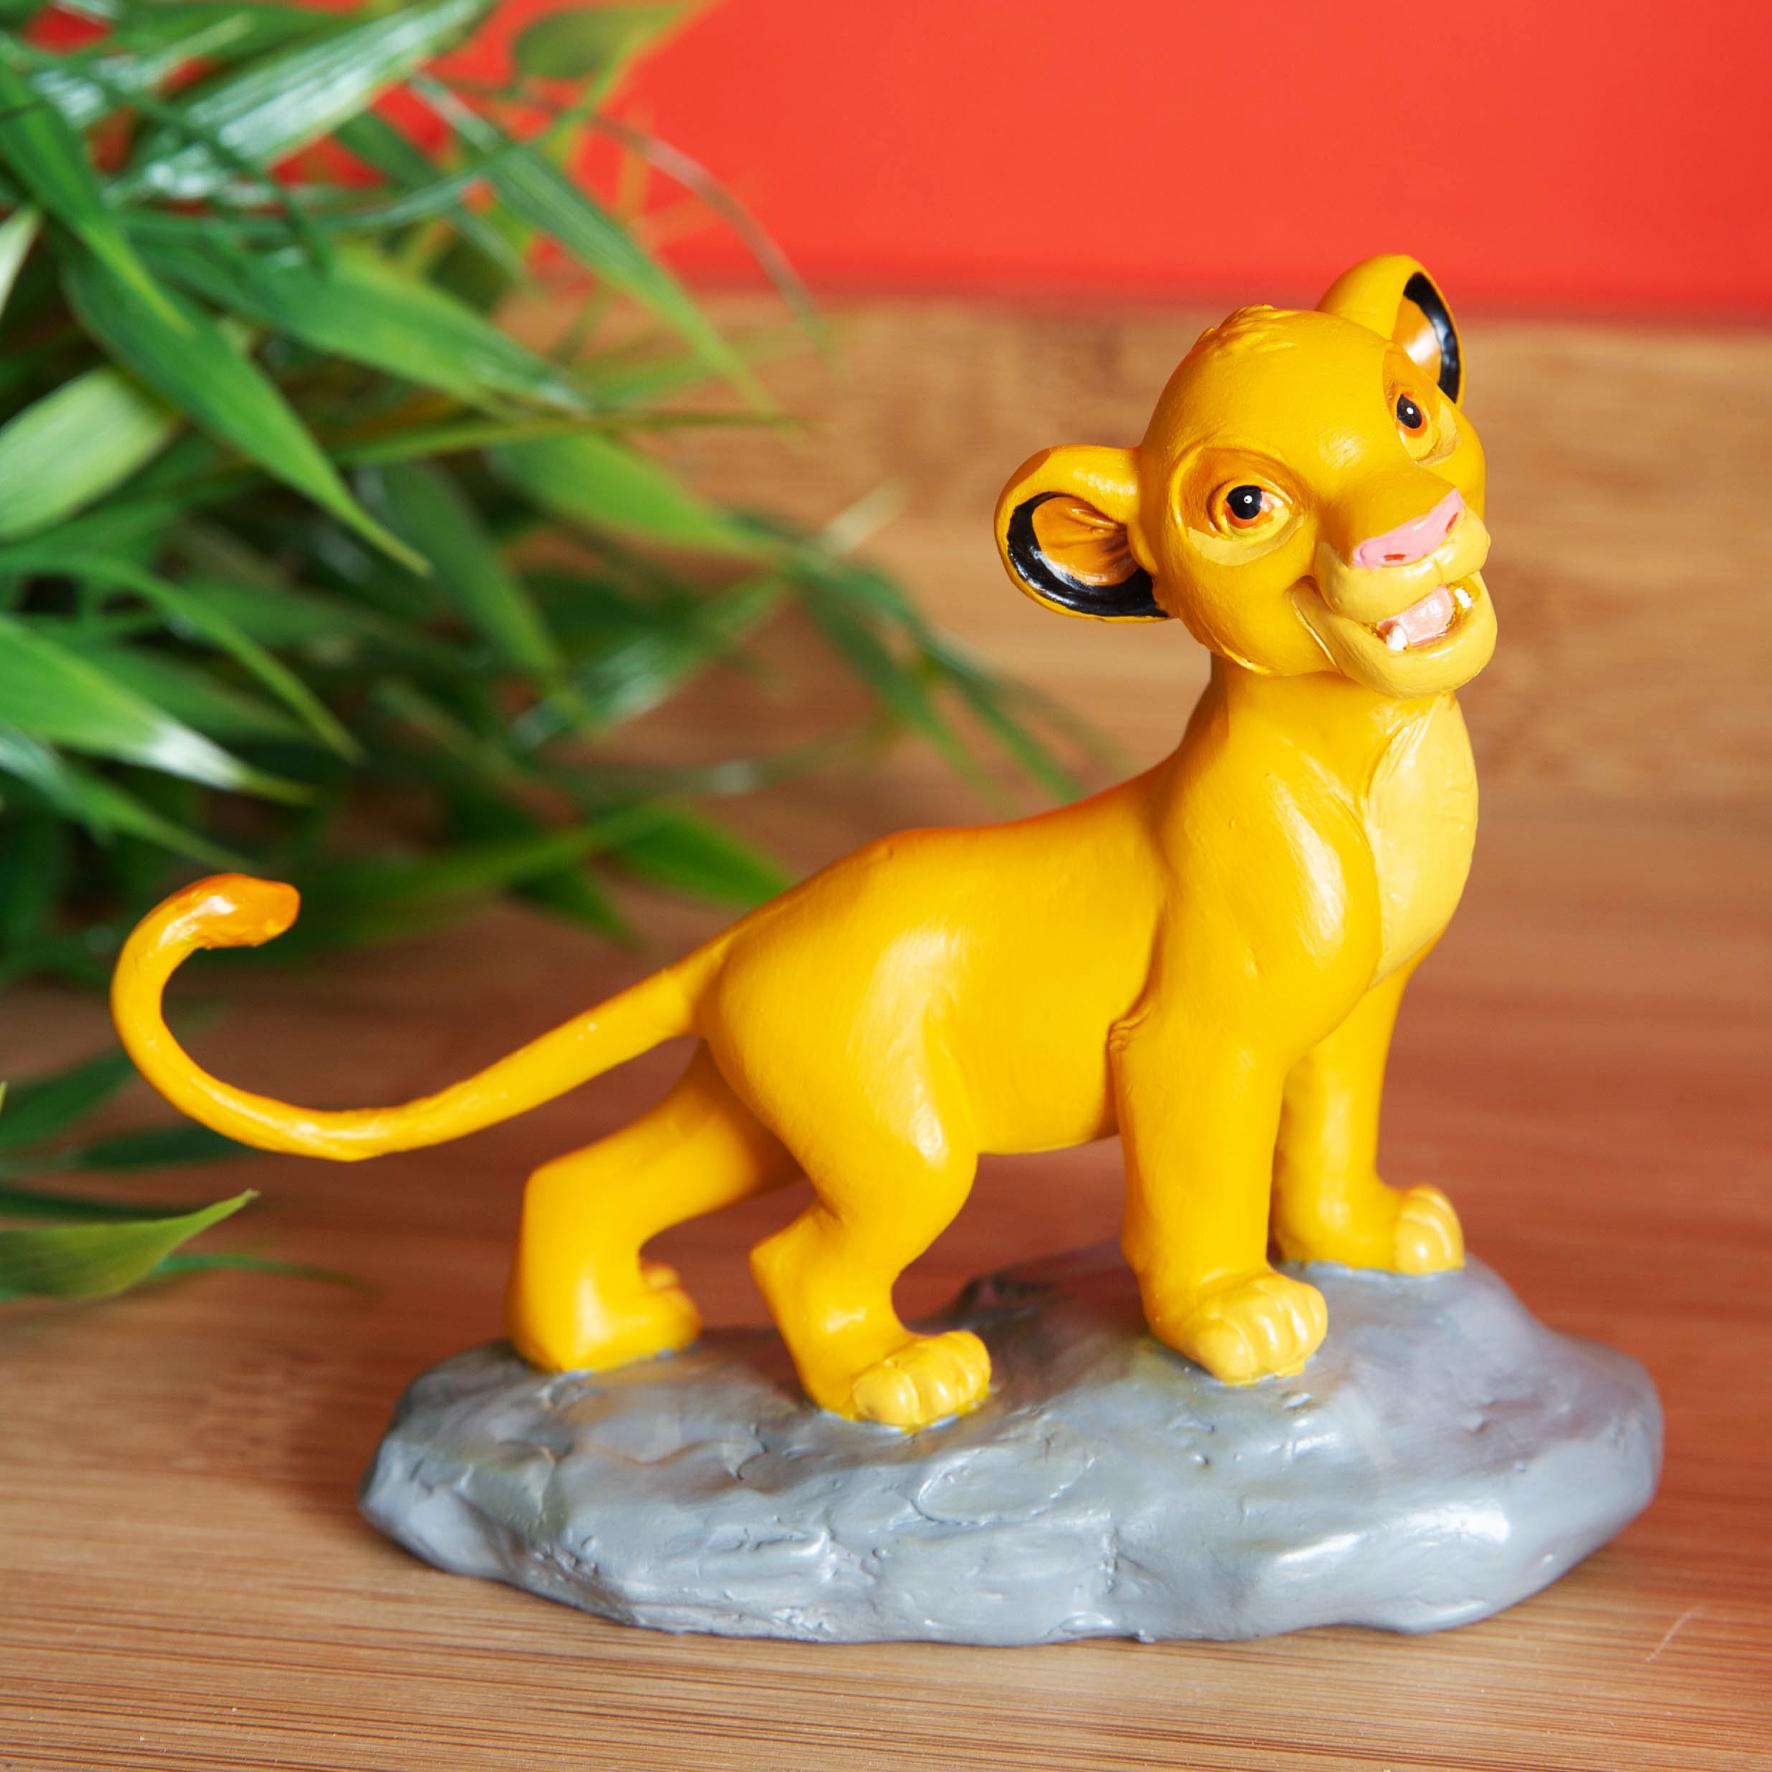 Disney Simba Figurine - The Lion King